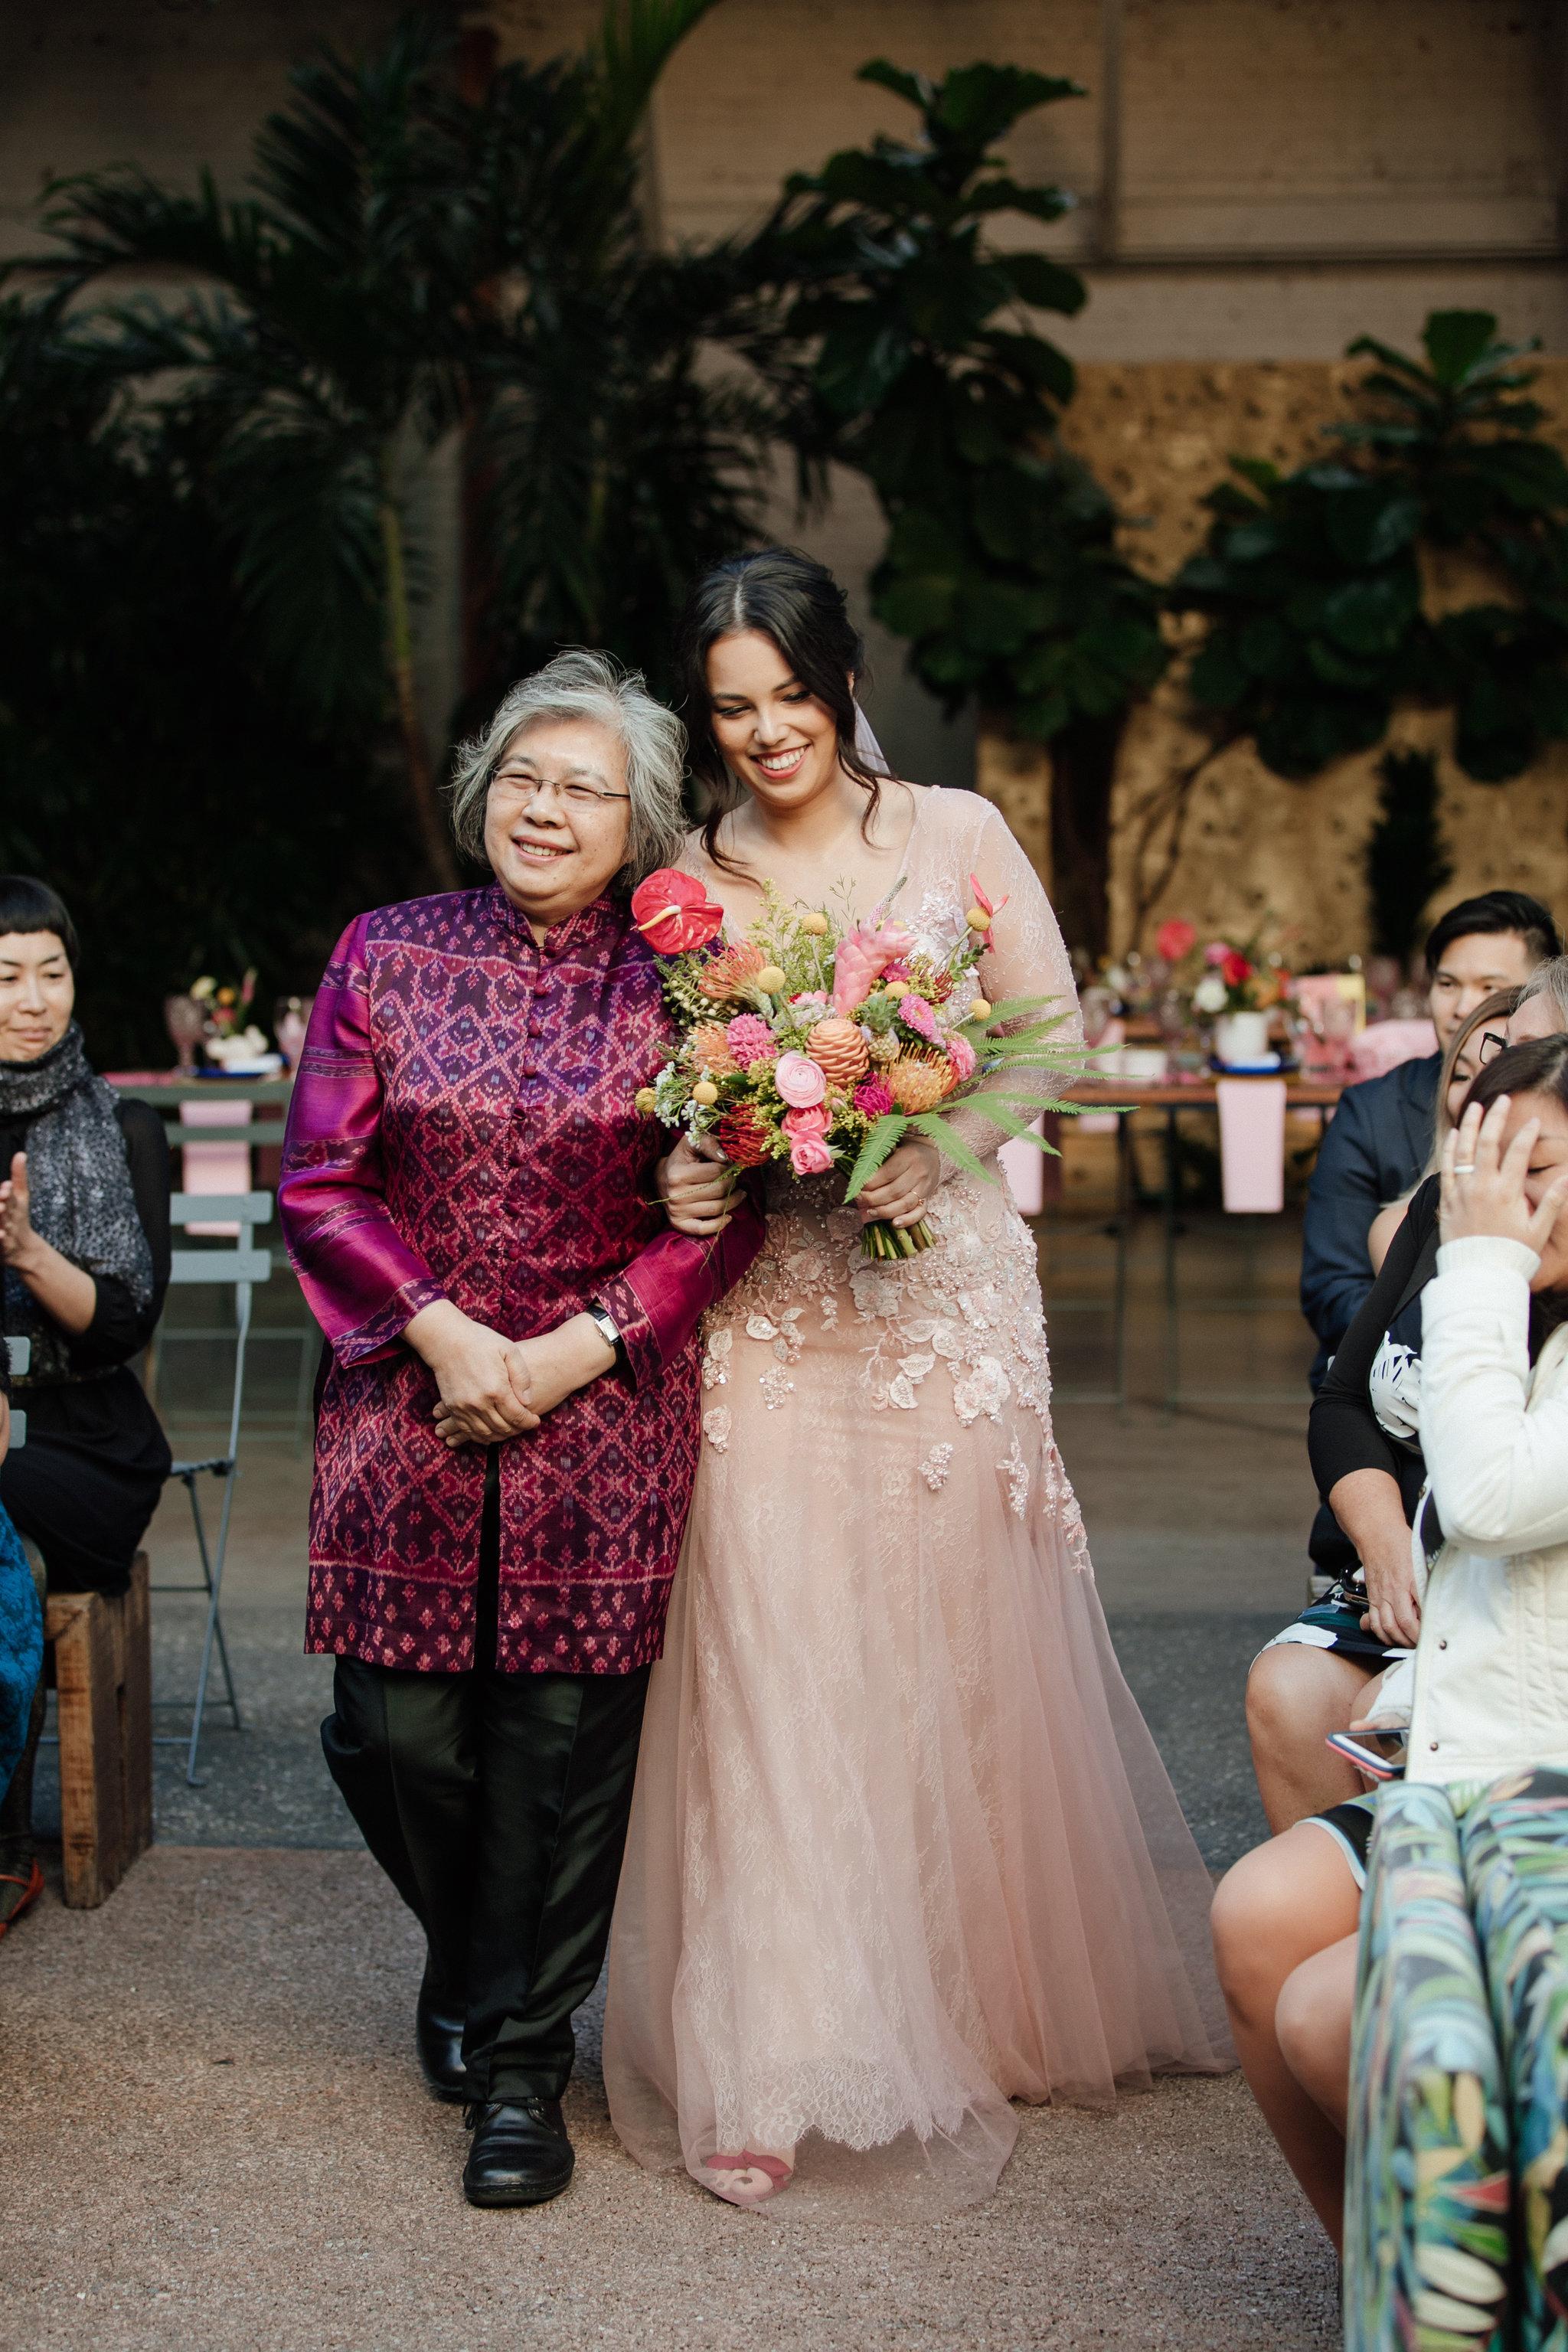 millwick-wedding-marble-rye-photography-030118-ceremony-040.jpg